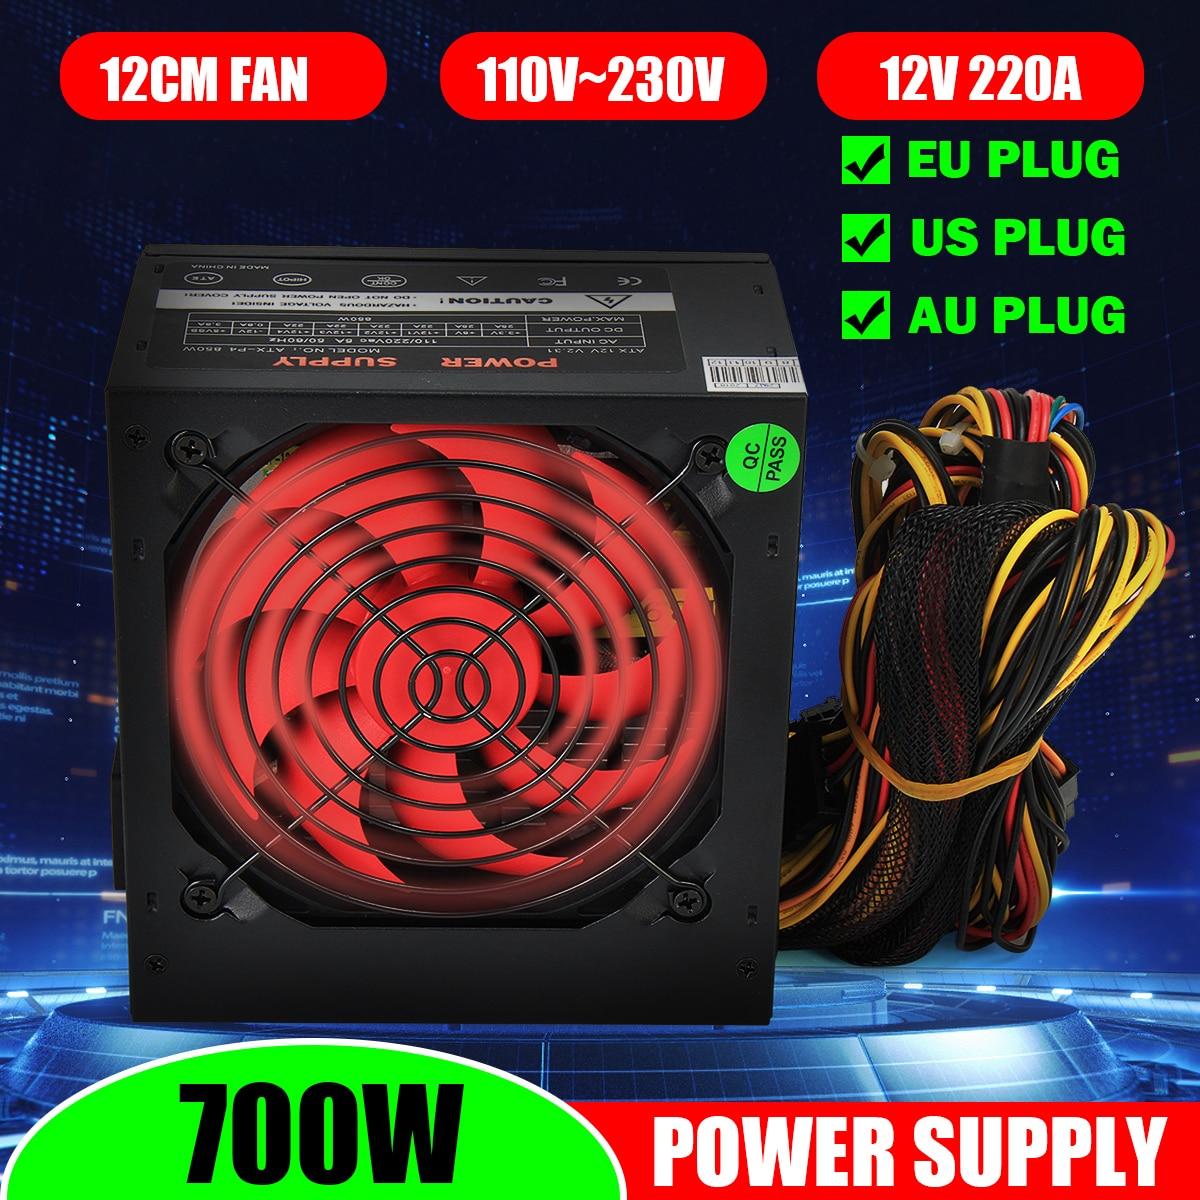 PSU PFC 700 W Watt silencioso ventilador ATX 24 PIN 12CM